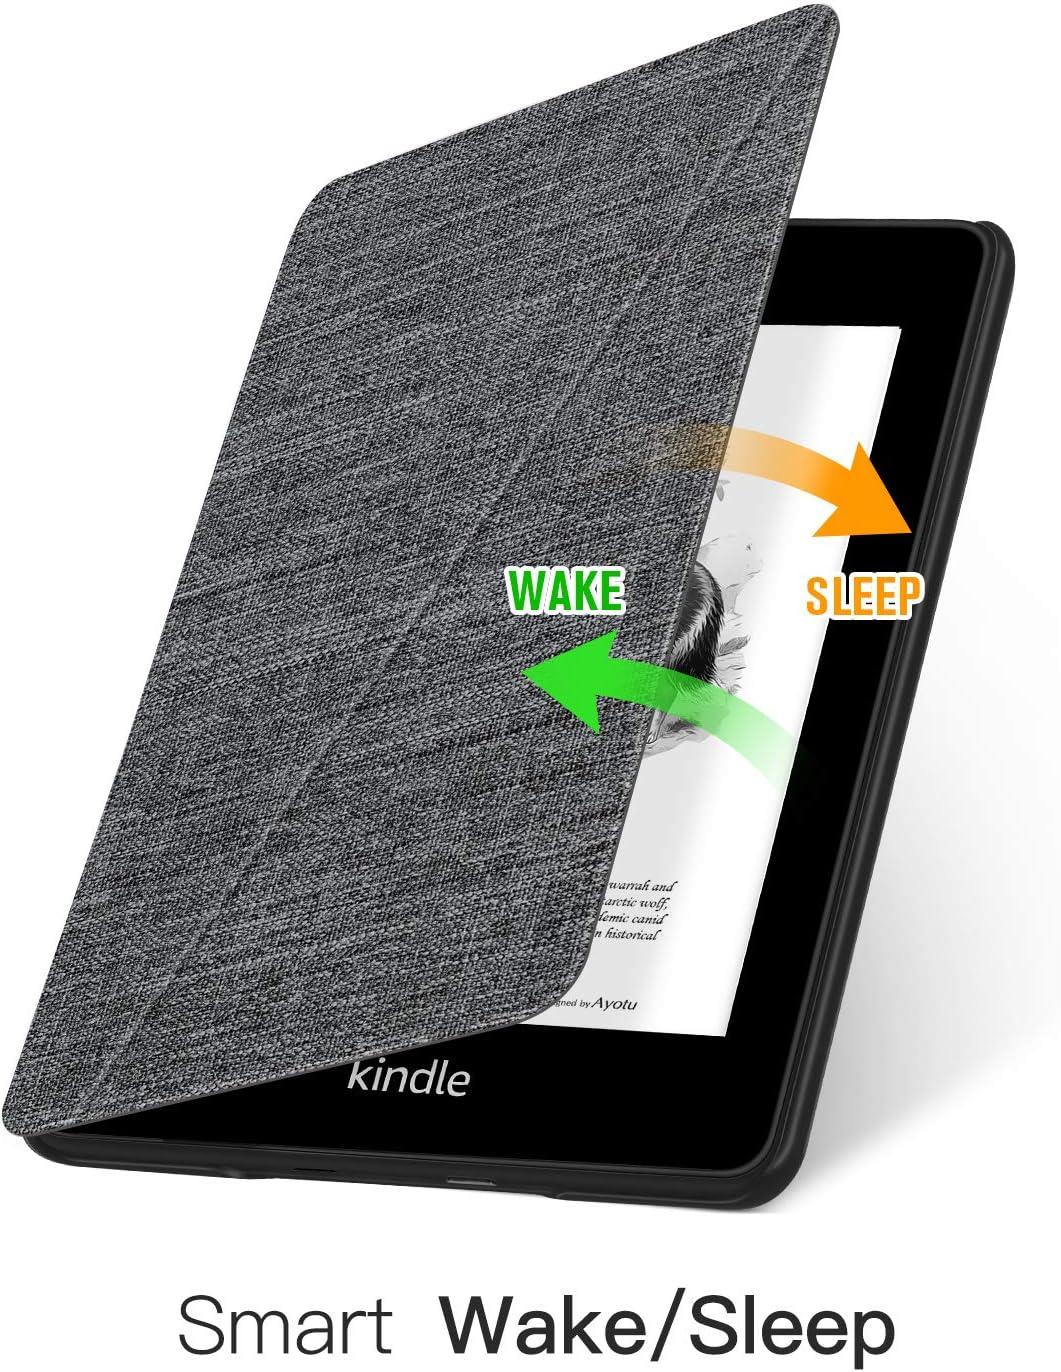 10a generaci/ón-2019 no Apta para Kindle Paperwhite d/écimo Funda para Soporte de Manos Libres con activaci/ón//suspensi/ón autom/ática Azul OLAIKE Funda Plegable de Tela Solo para Kindle